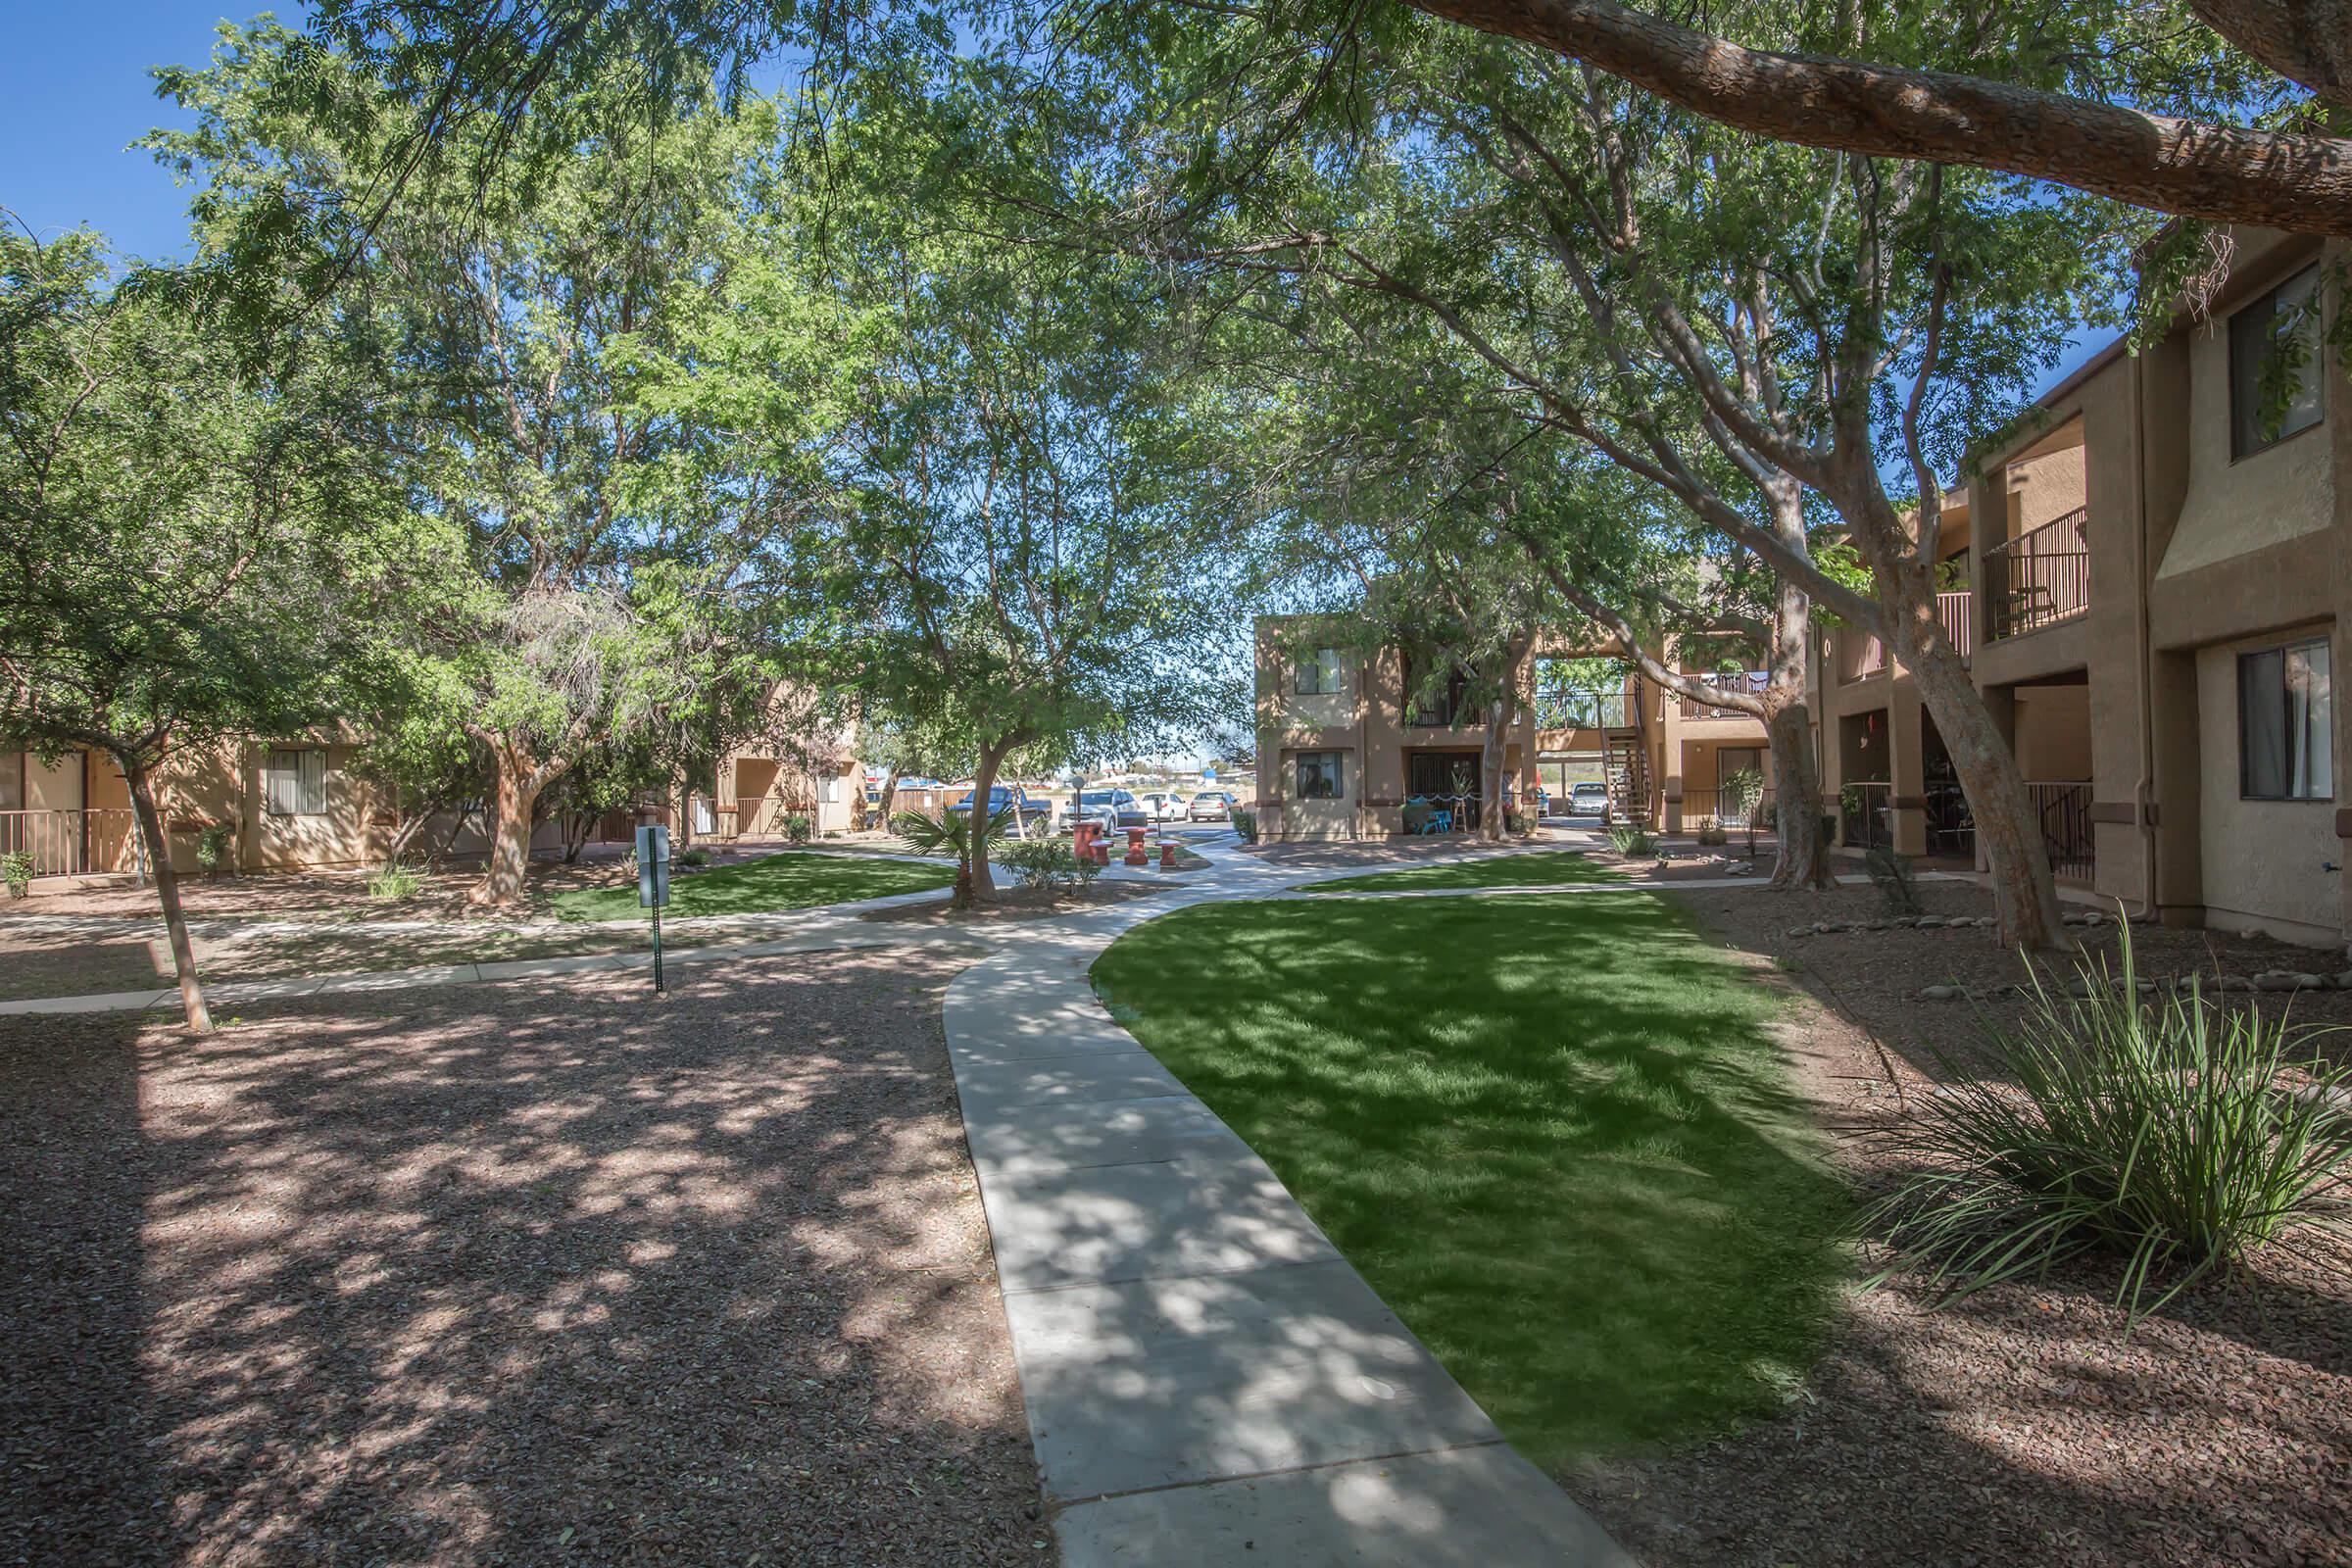 a tree lined street